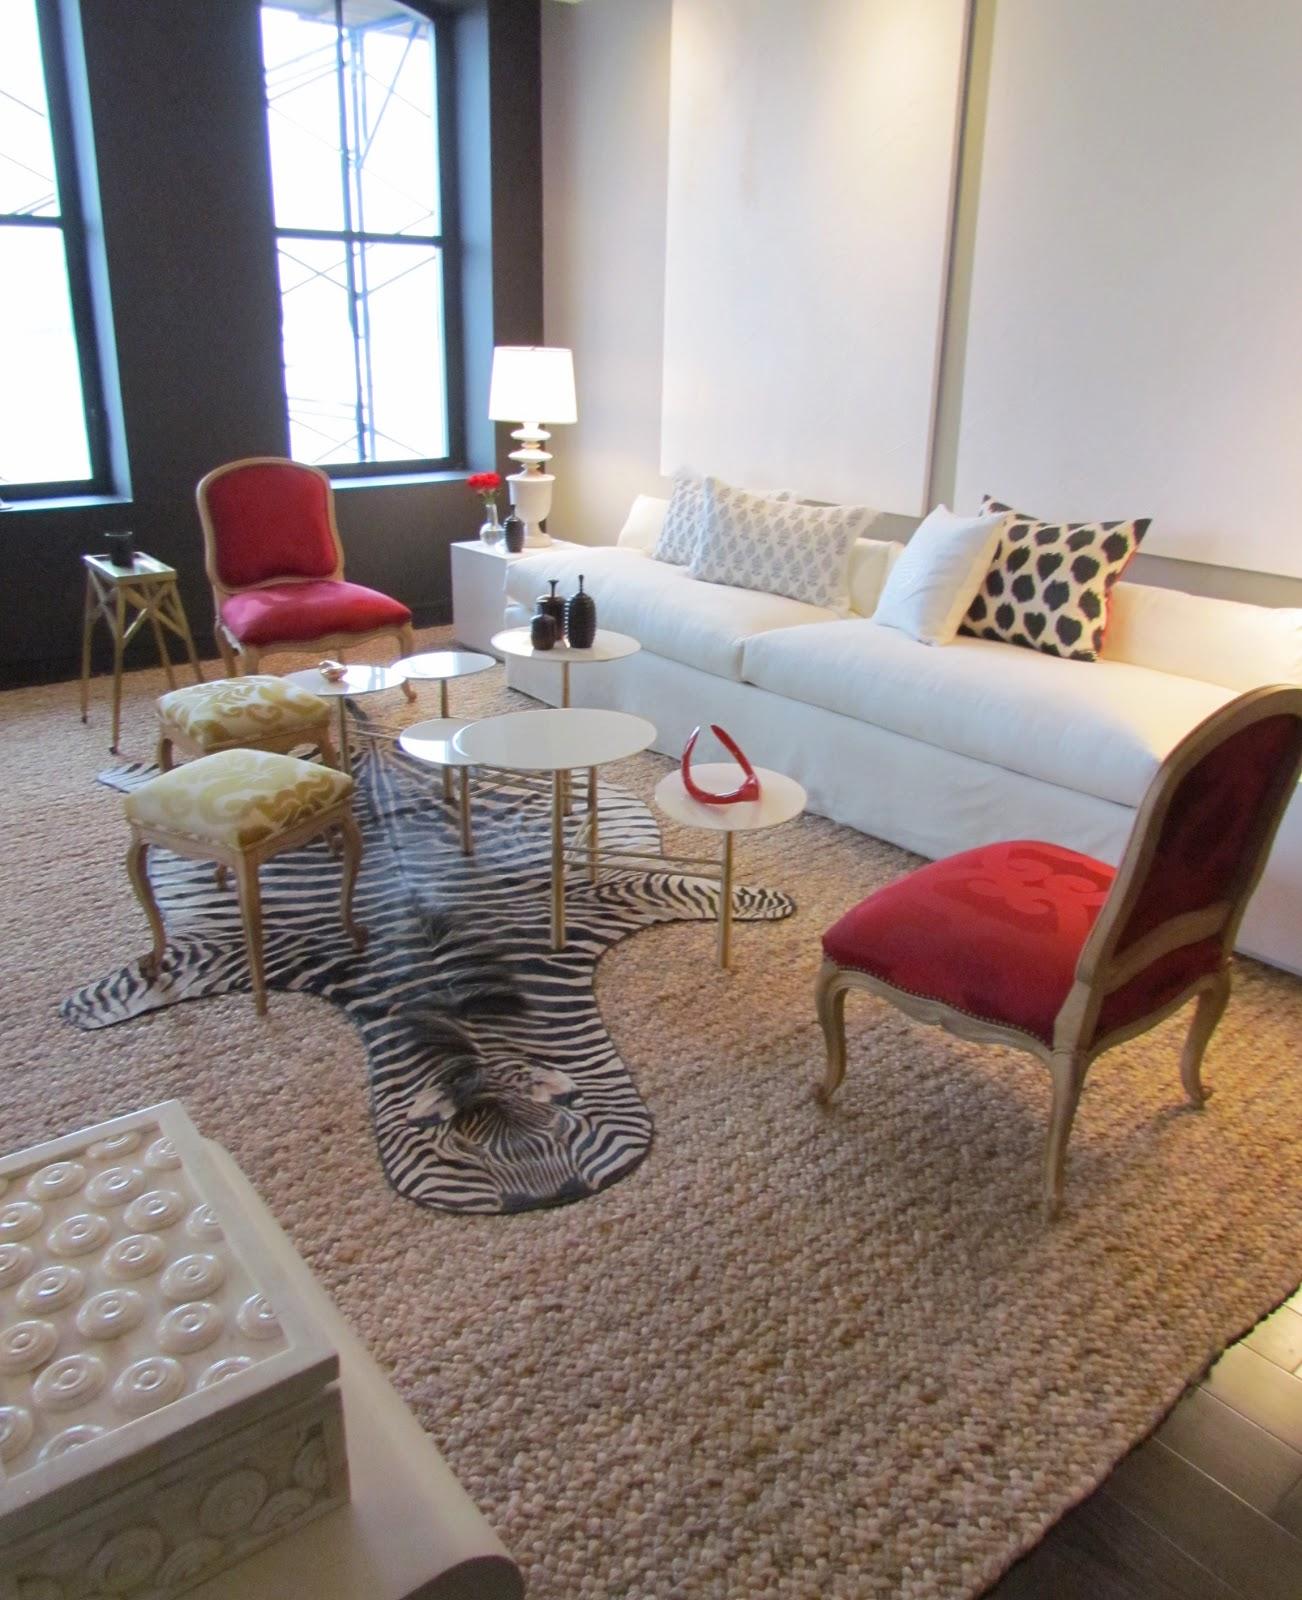 Antony Todd Sofa Pink For Mobile Dec A Porter Imagination Home Designer Visions